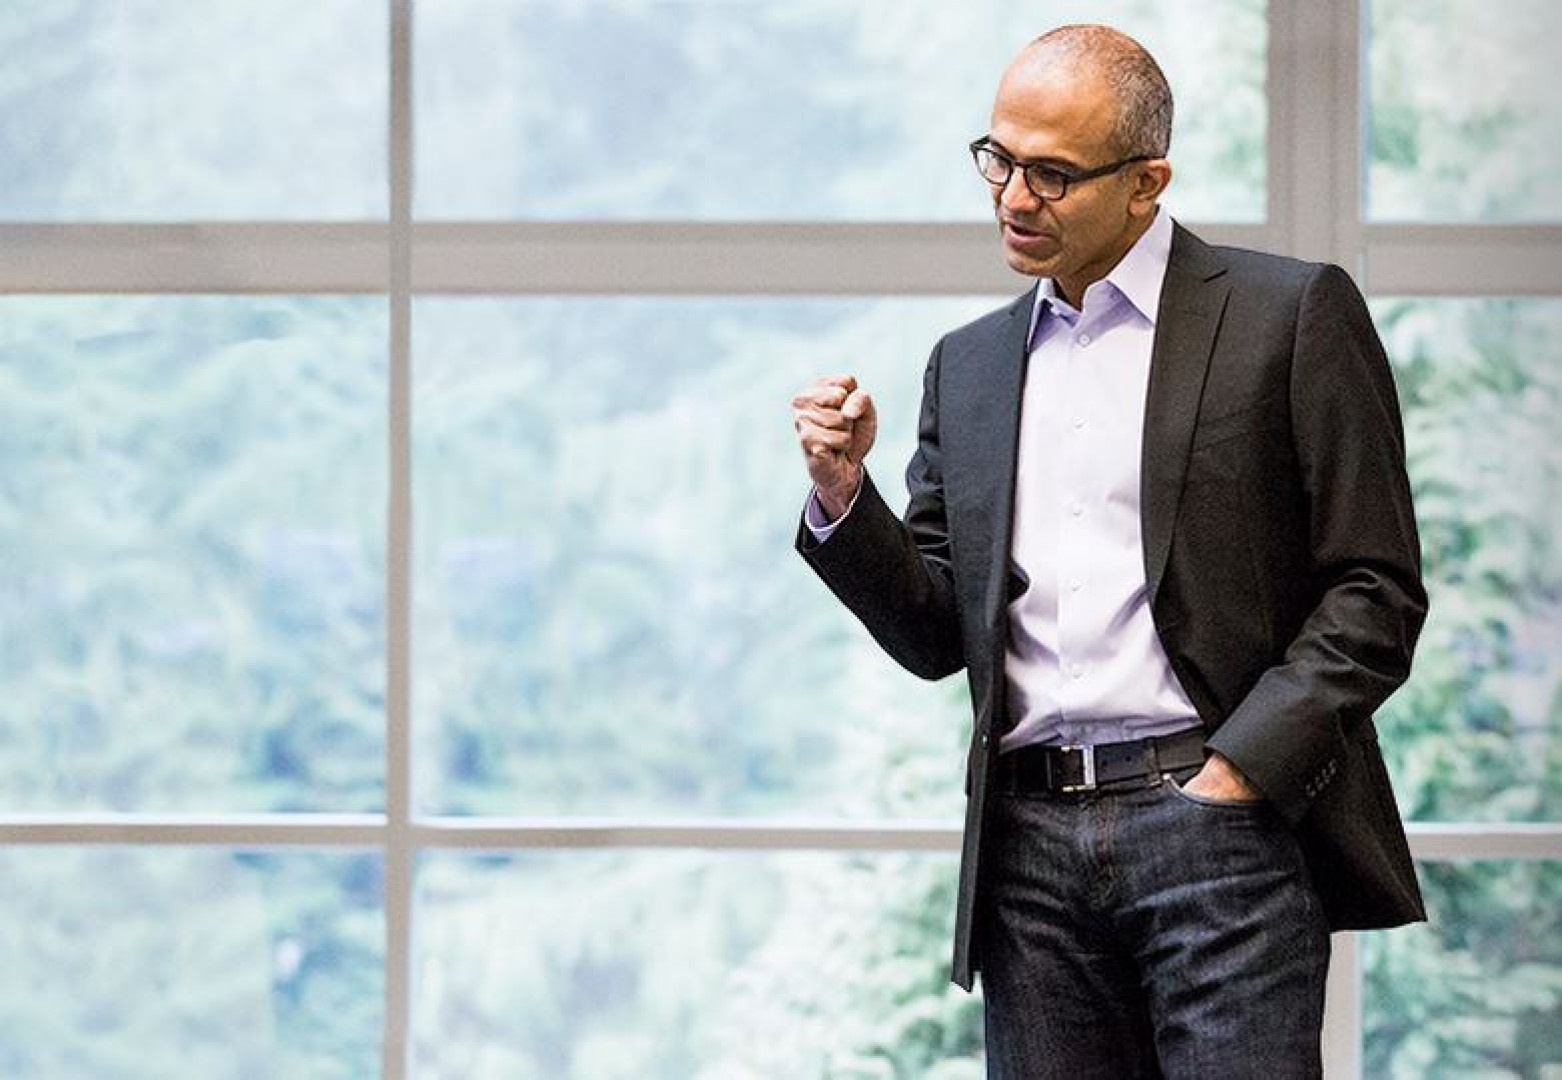 Satya Nadella, dyrektor generalny Microsoftu (fot. Bhupinder Nayyar/flickr.com/CC BY 2.0)